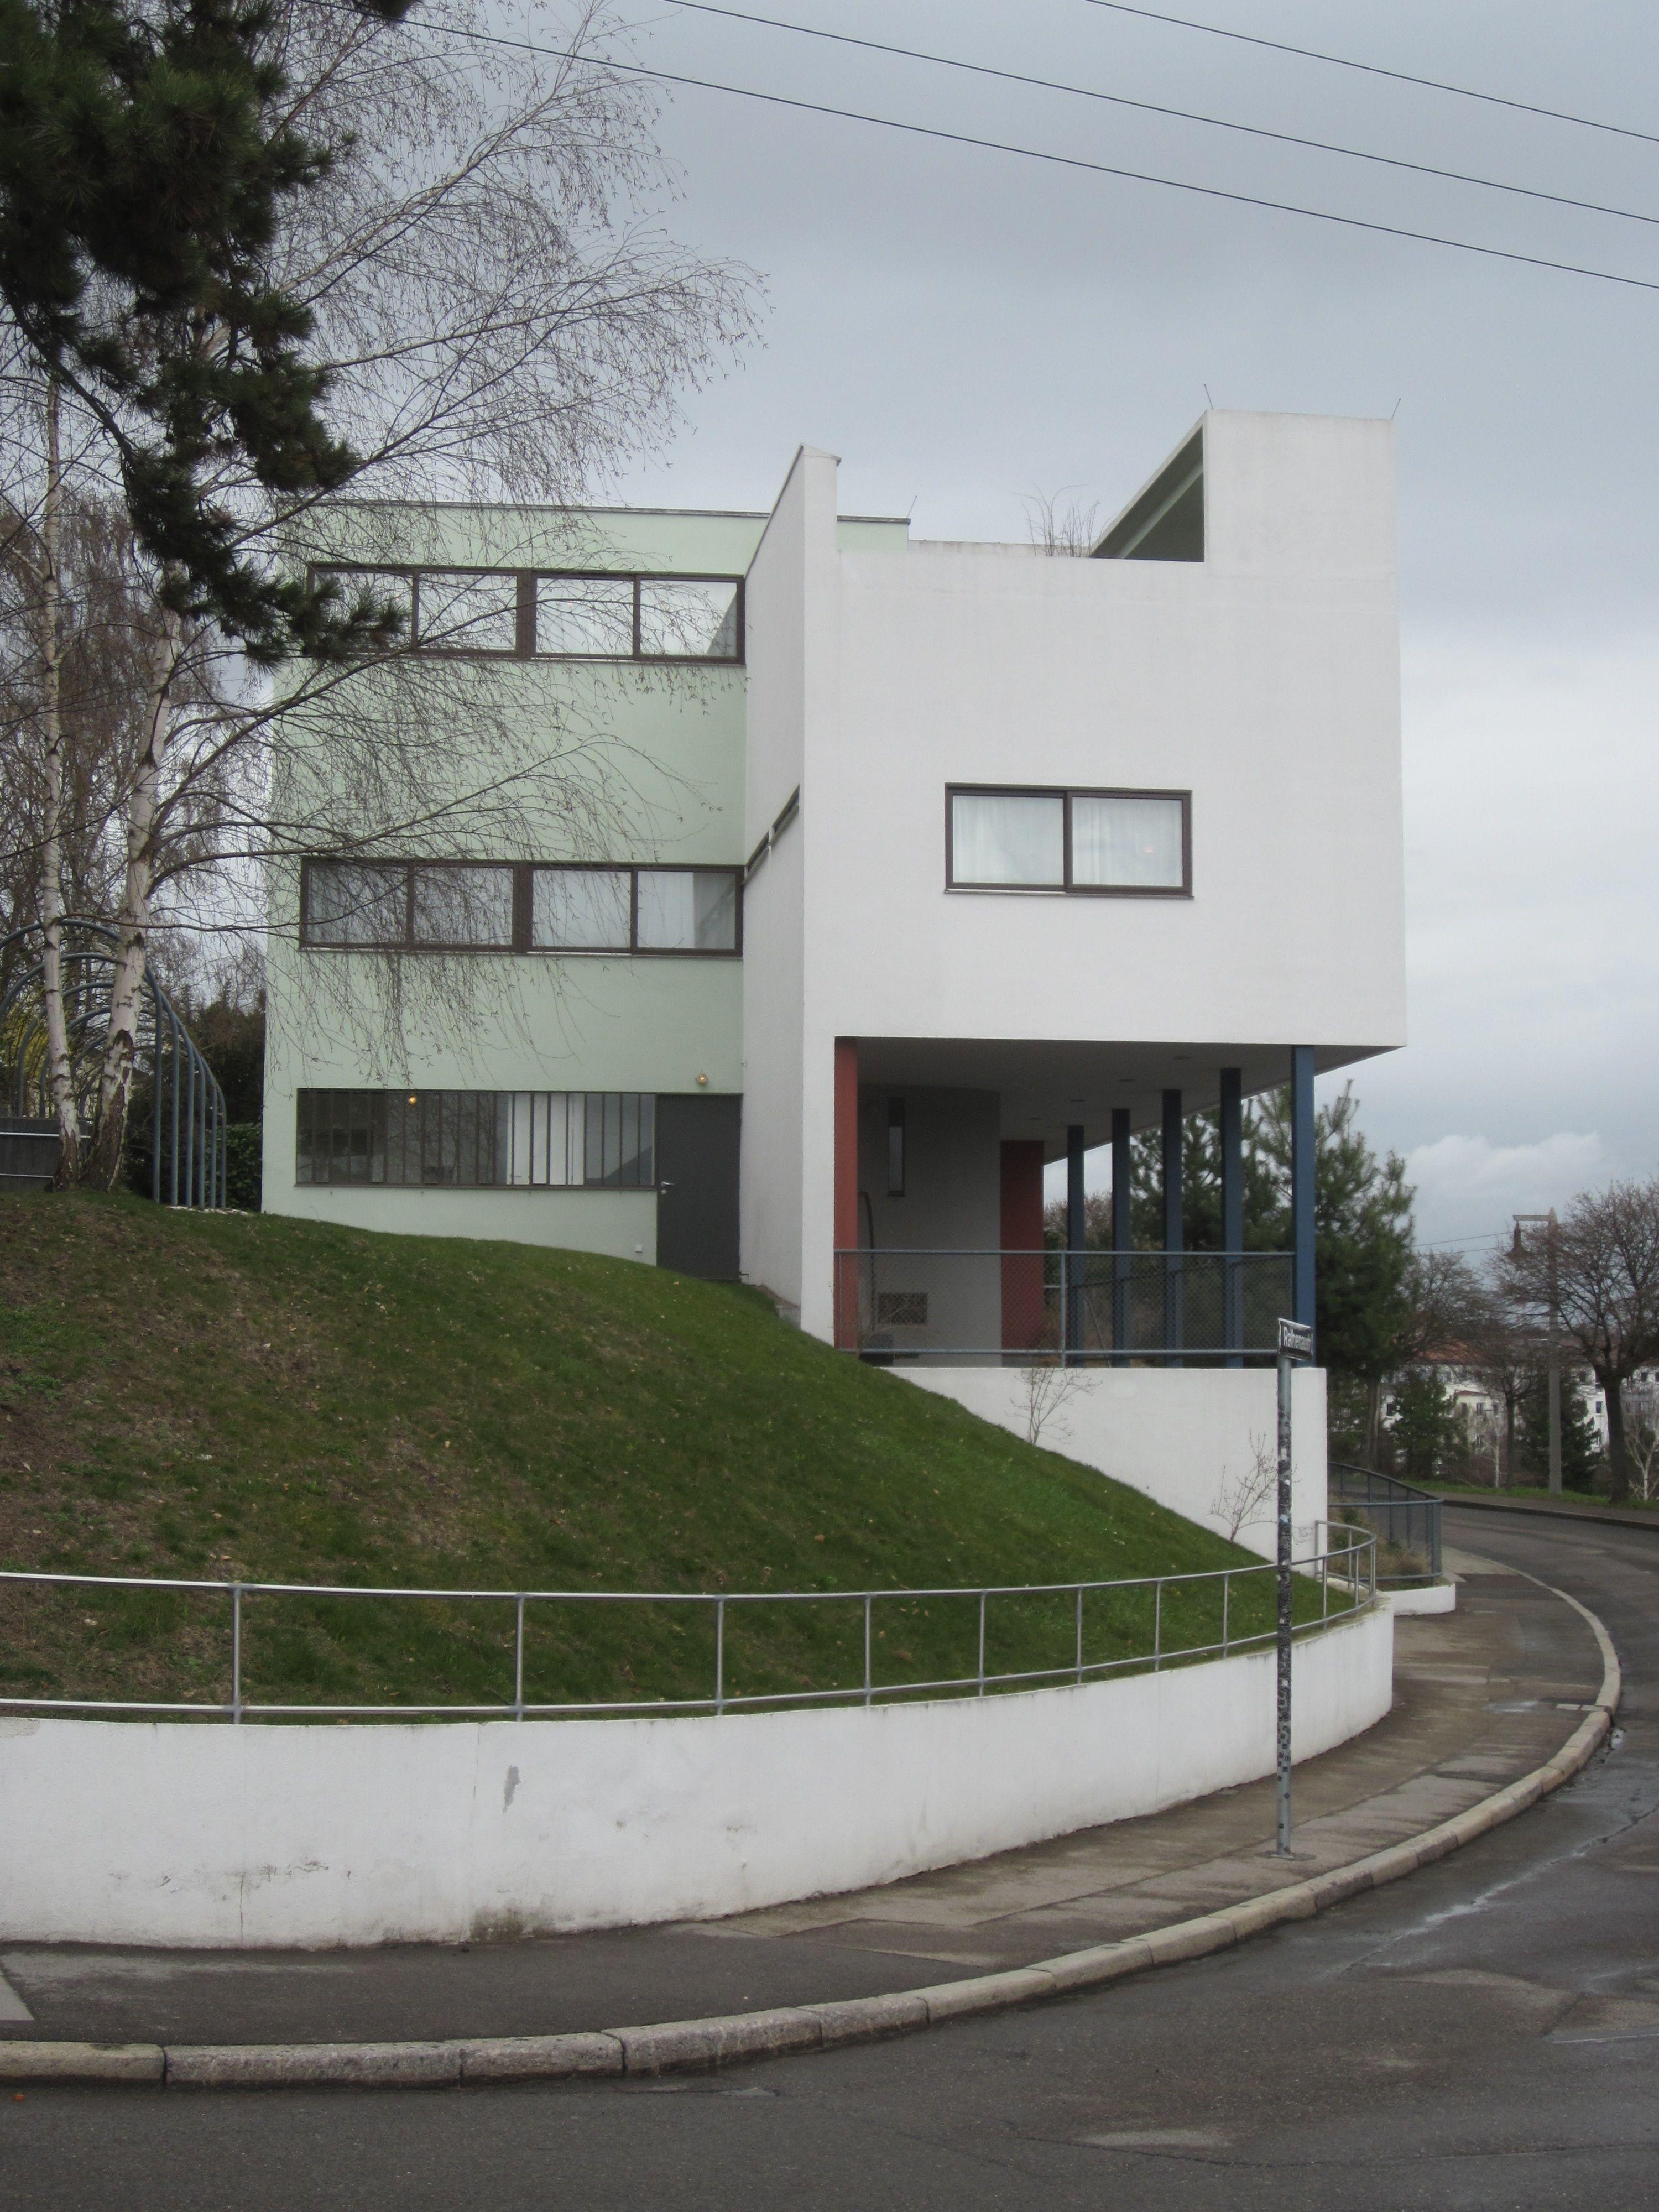 Le corbusier weissenhof estate bauhaus architecture for Architecture le corbusier